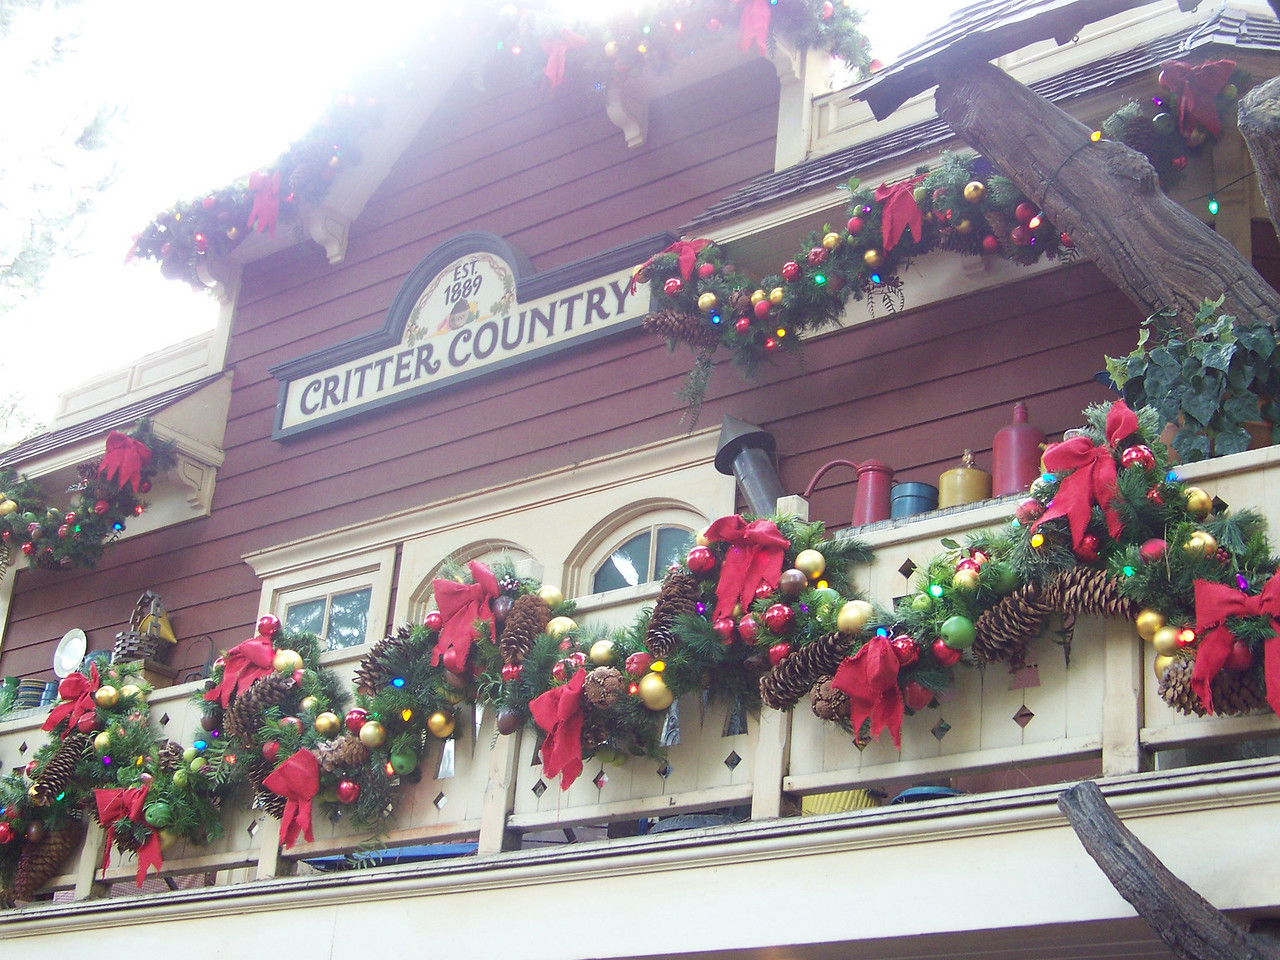 Disneyland - Critter Country